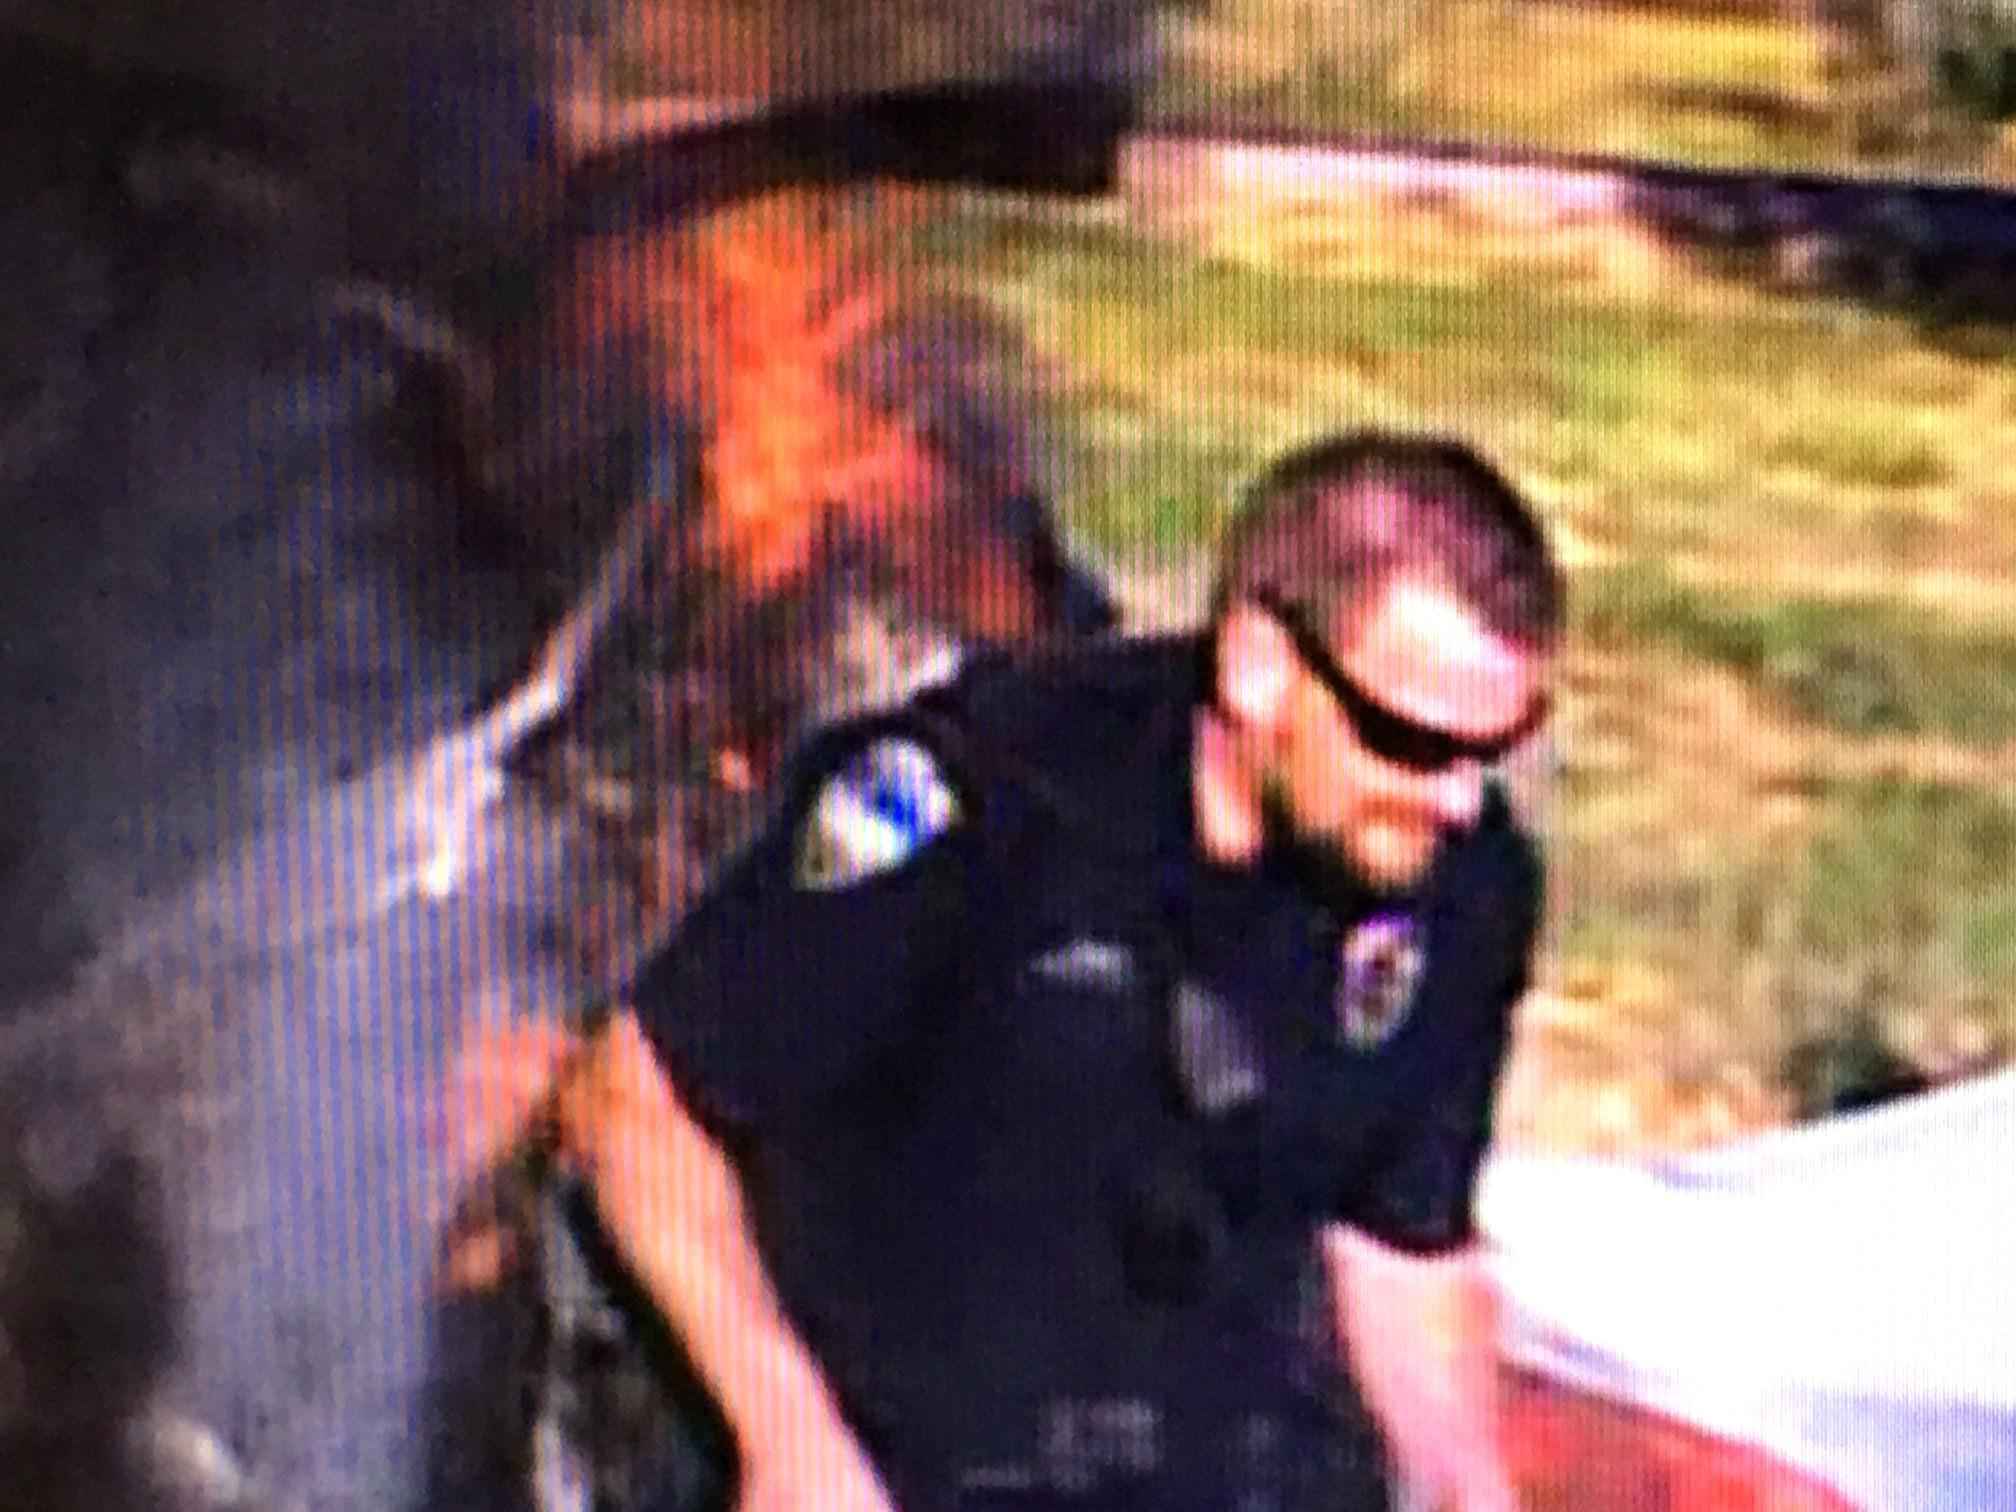 Nasty cop takes teens